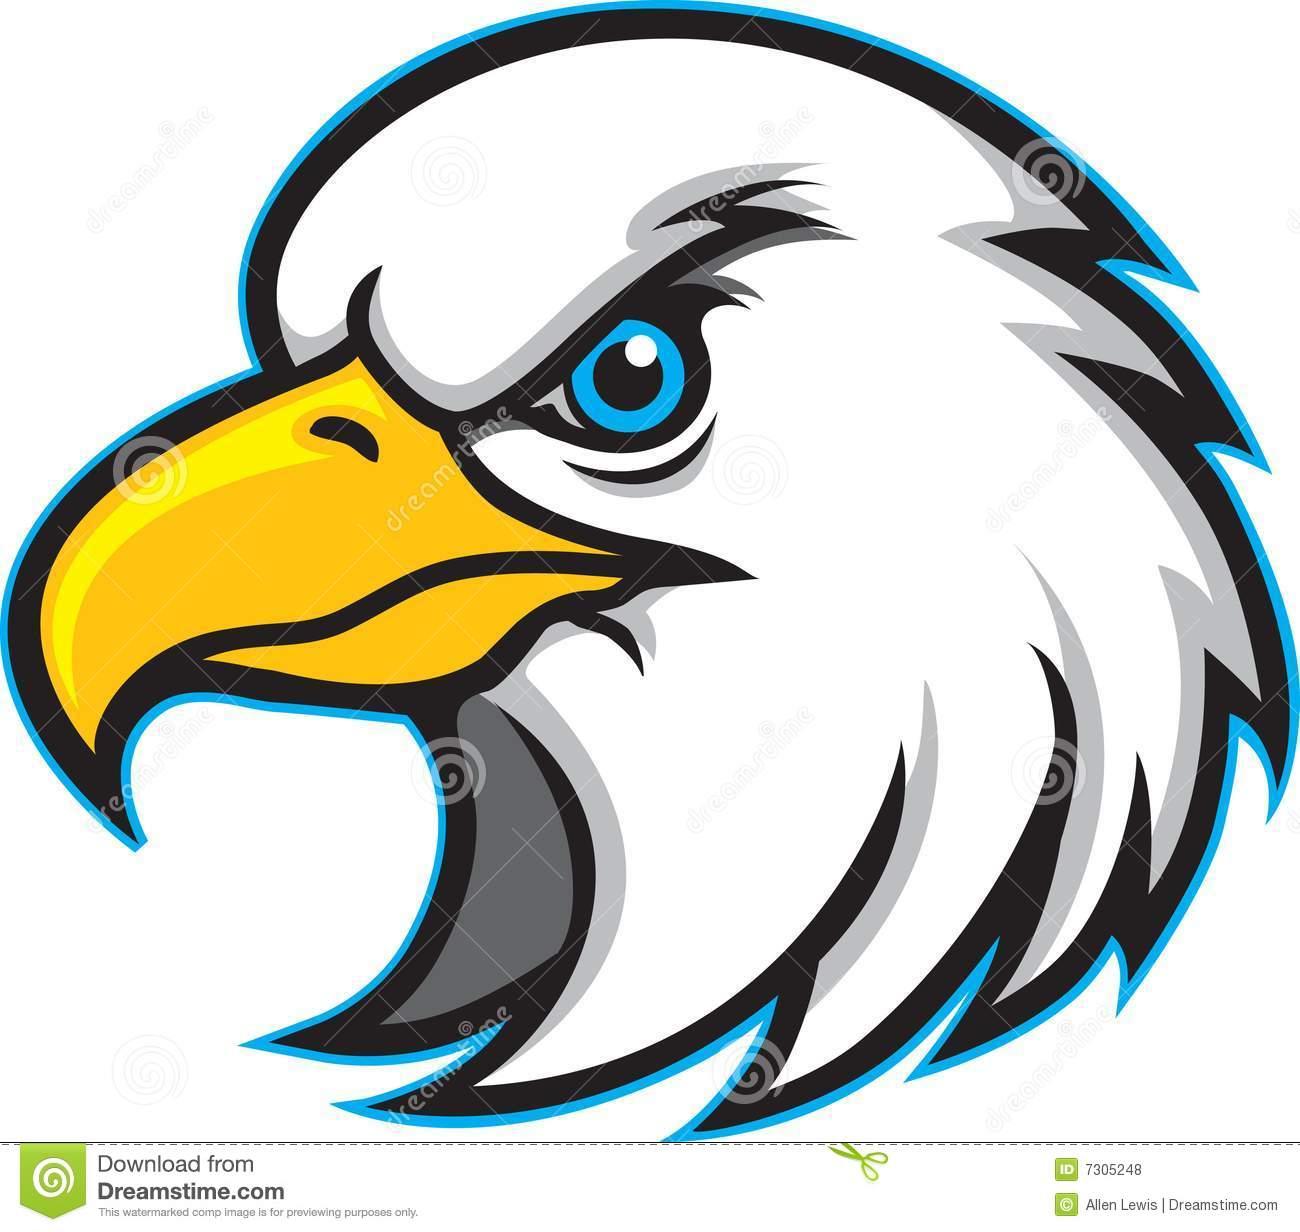 Eagle Mascot Clipart - Clipart Suggest